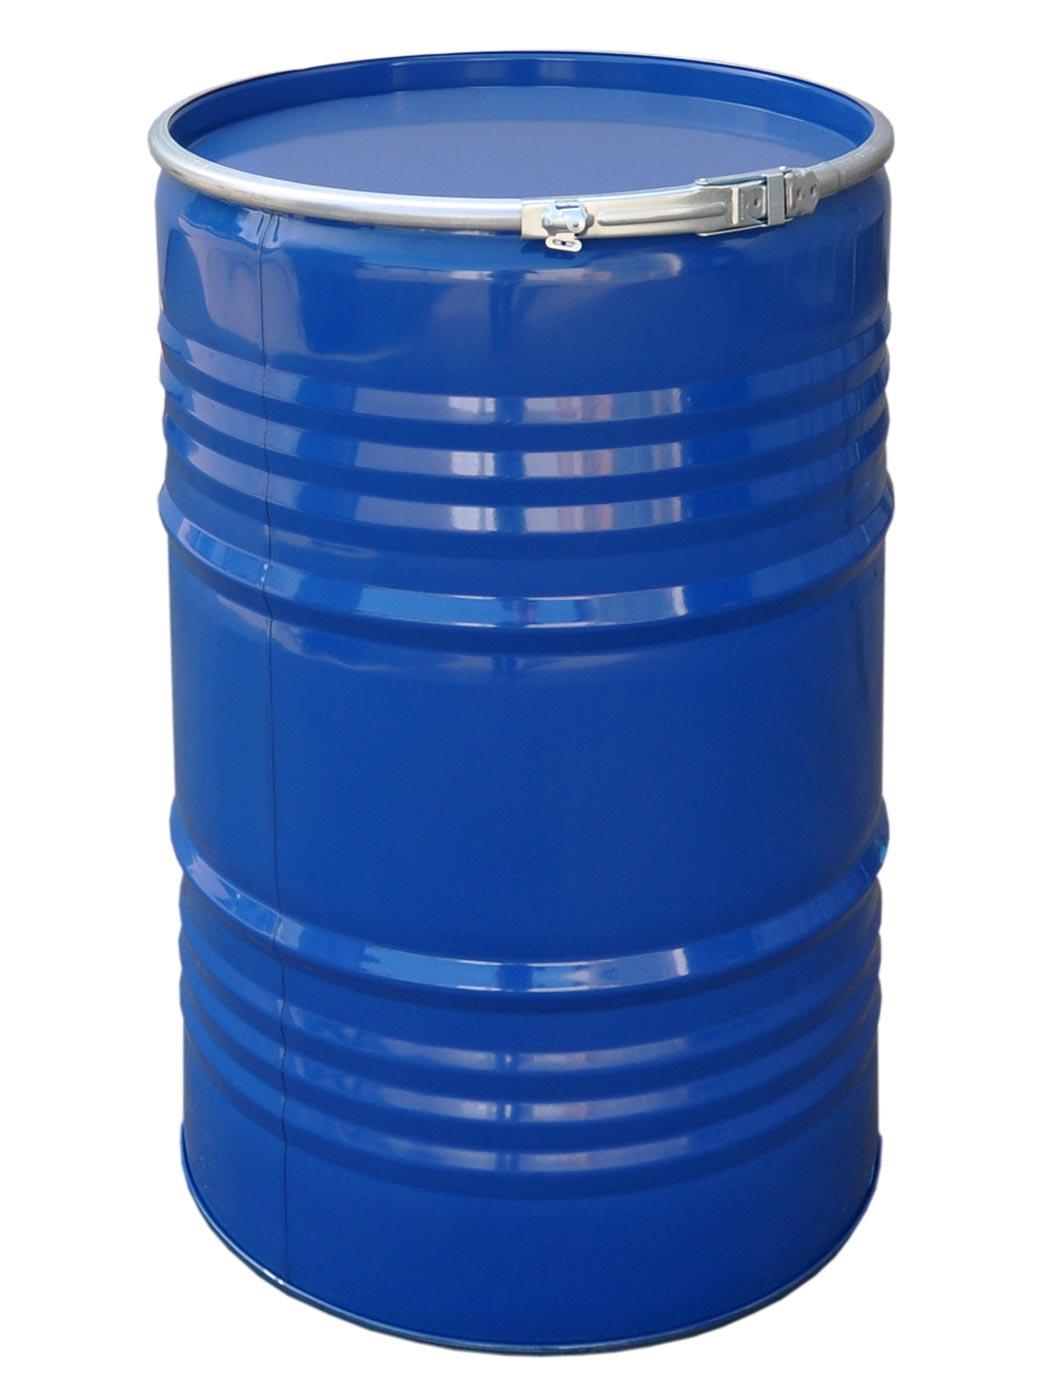 stahlfass 213 liter blau deckelfass feuertonne fass metallbeh lter neu 23031 ebay. Black Bedroom Furniture Sets. Home Design Ideas